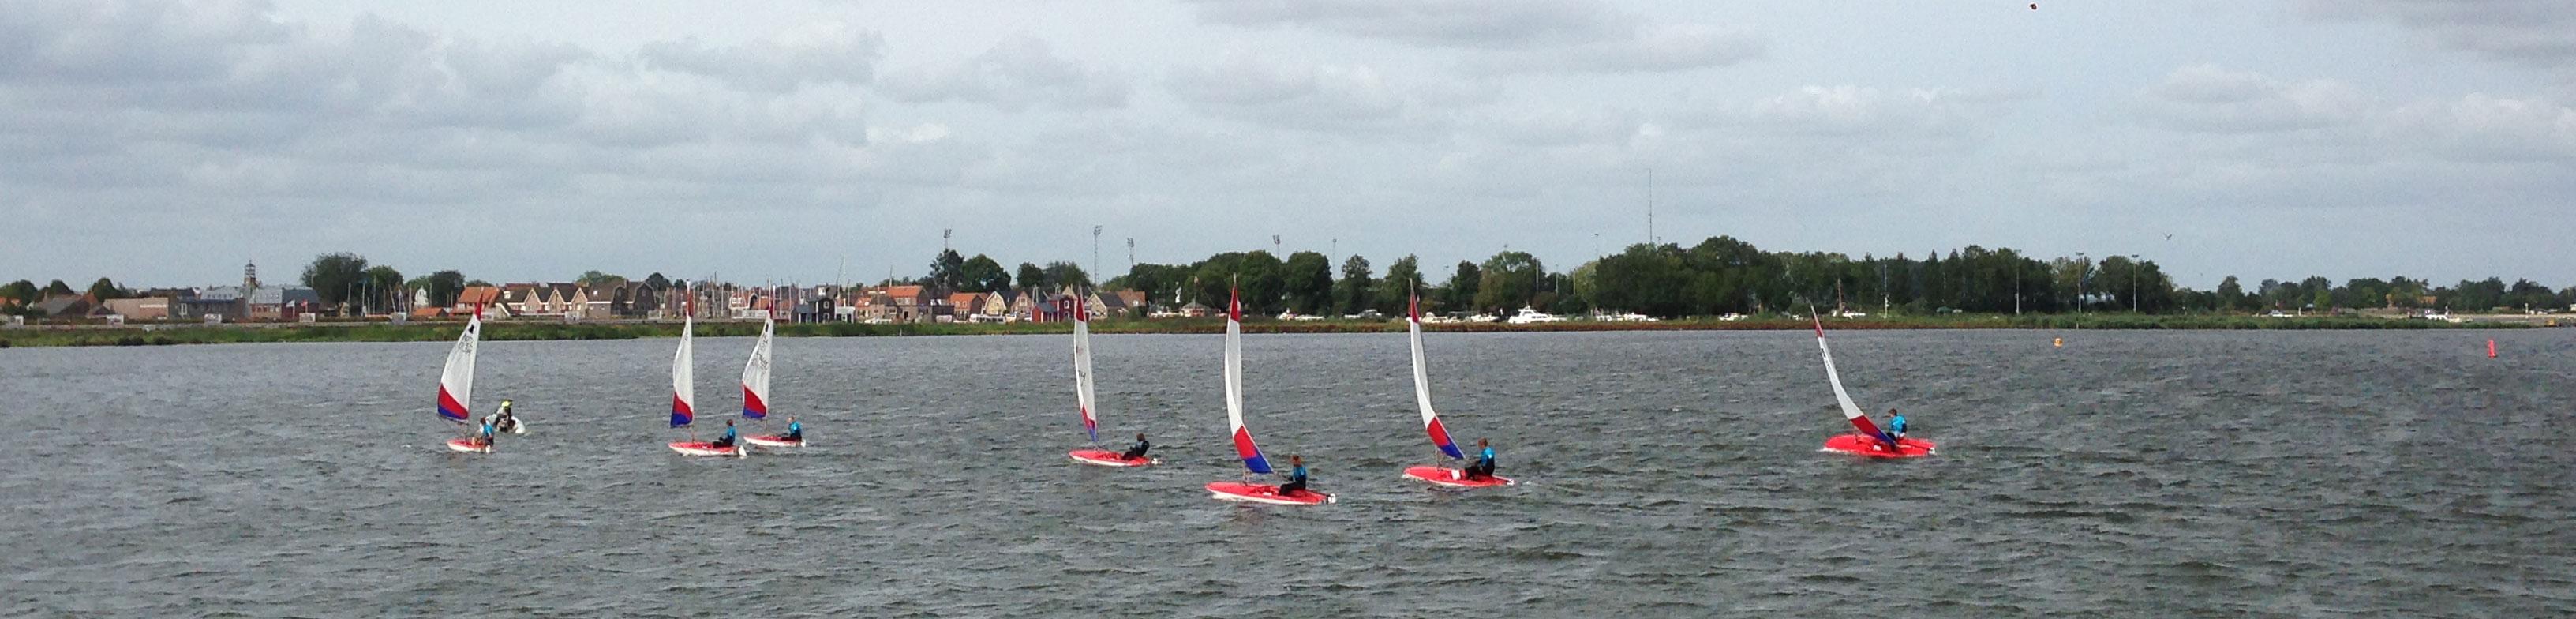 Zeilschool Midden Nederland | Eemhof Watersport & Beachclub